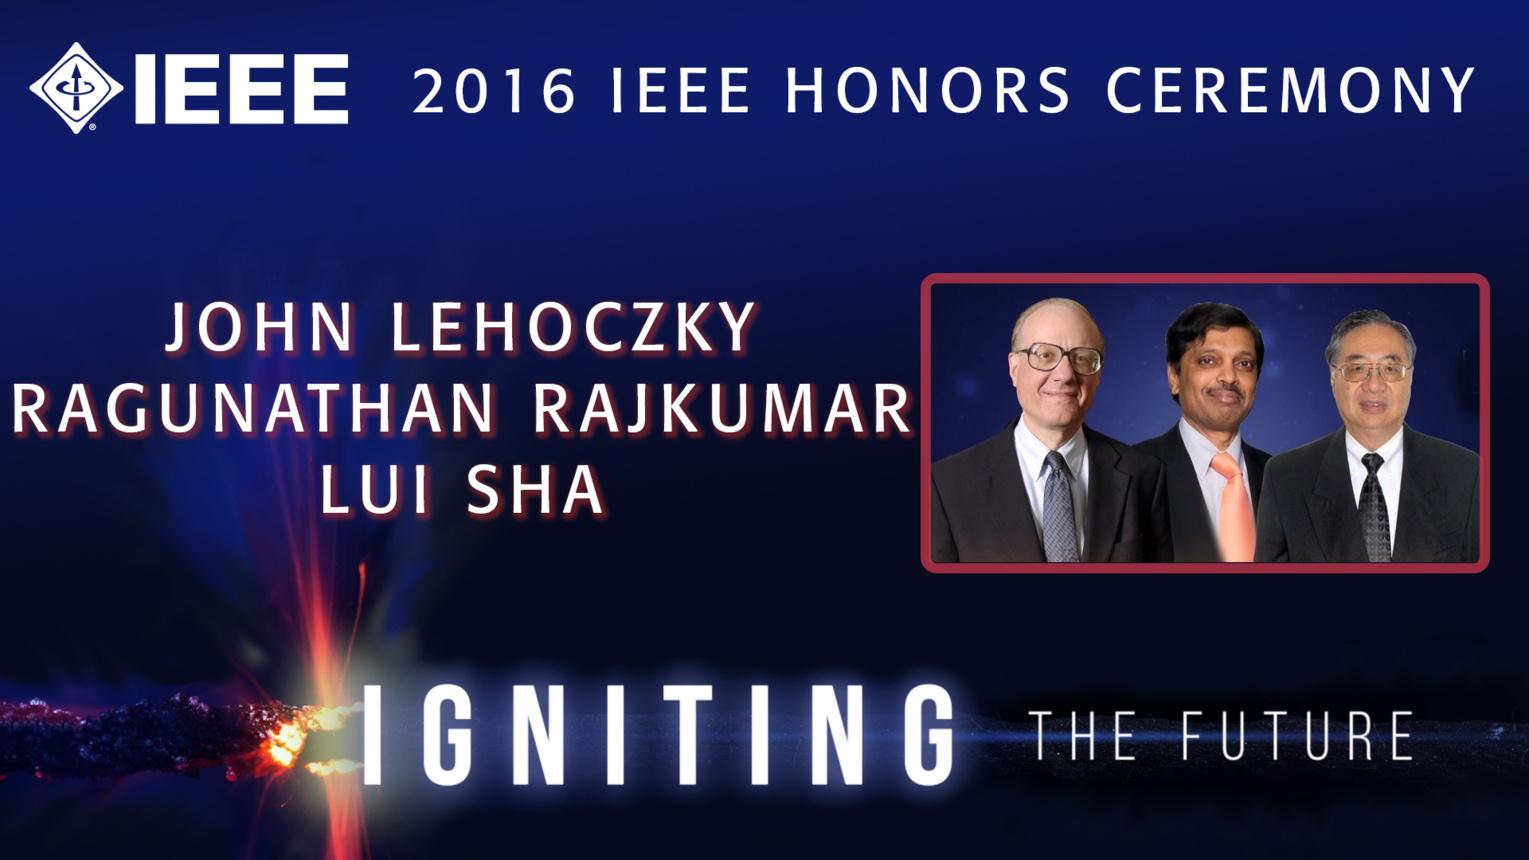 John P. Lehoczky, Ragunathan Rajkumar and Lui Sha accept the IEEE Simon Ramo Medal - Honors Ceremony 2016